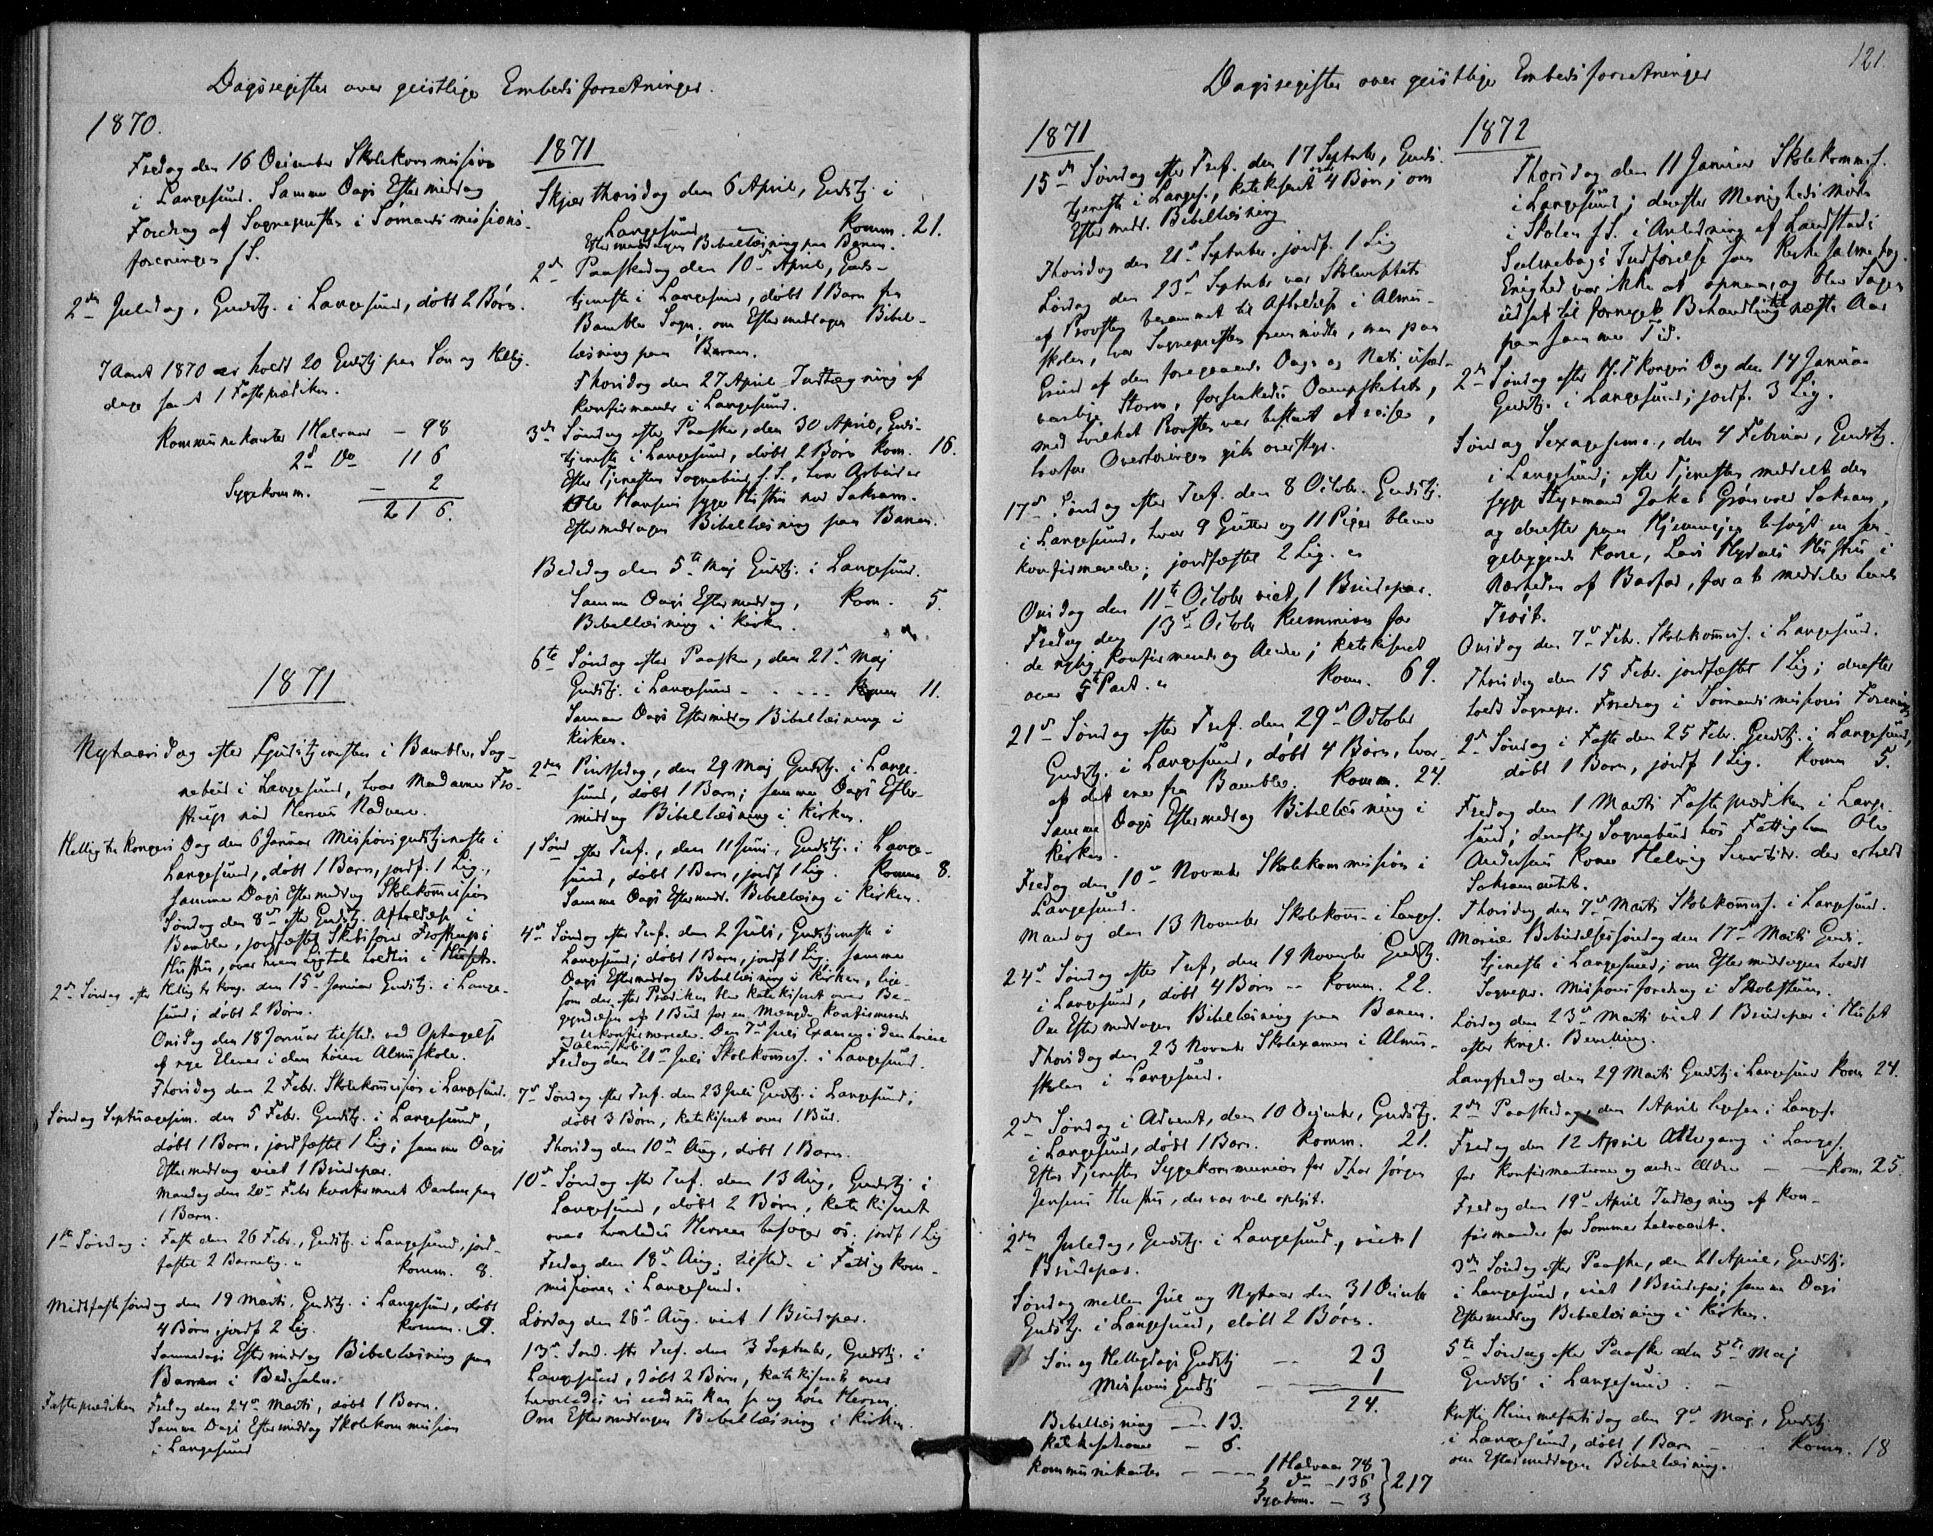 SAKO, Langesund kirkebøker, F/Fa/L0001: Ministerialbok nr. 1, 1870-1877, s. 121